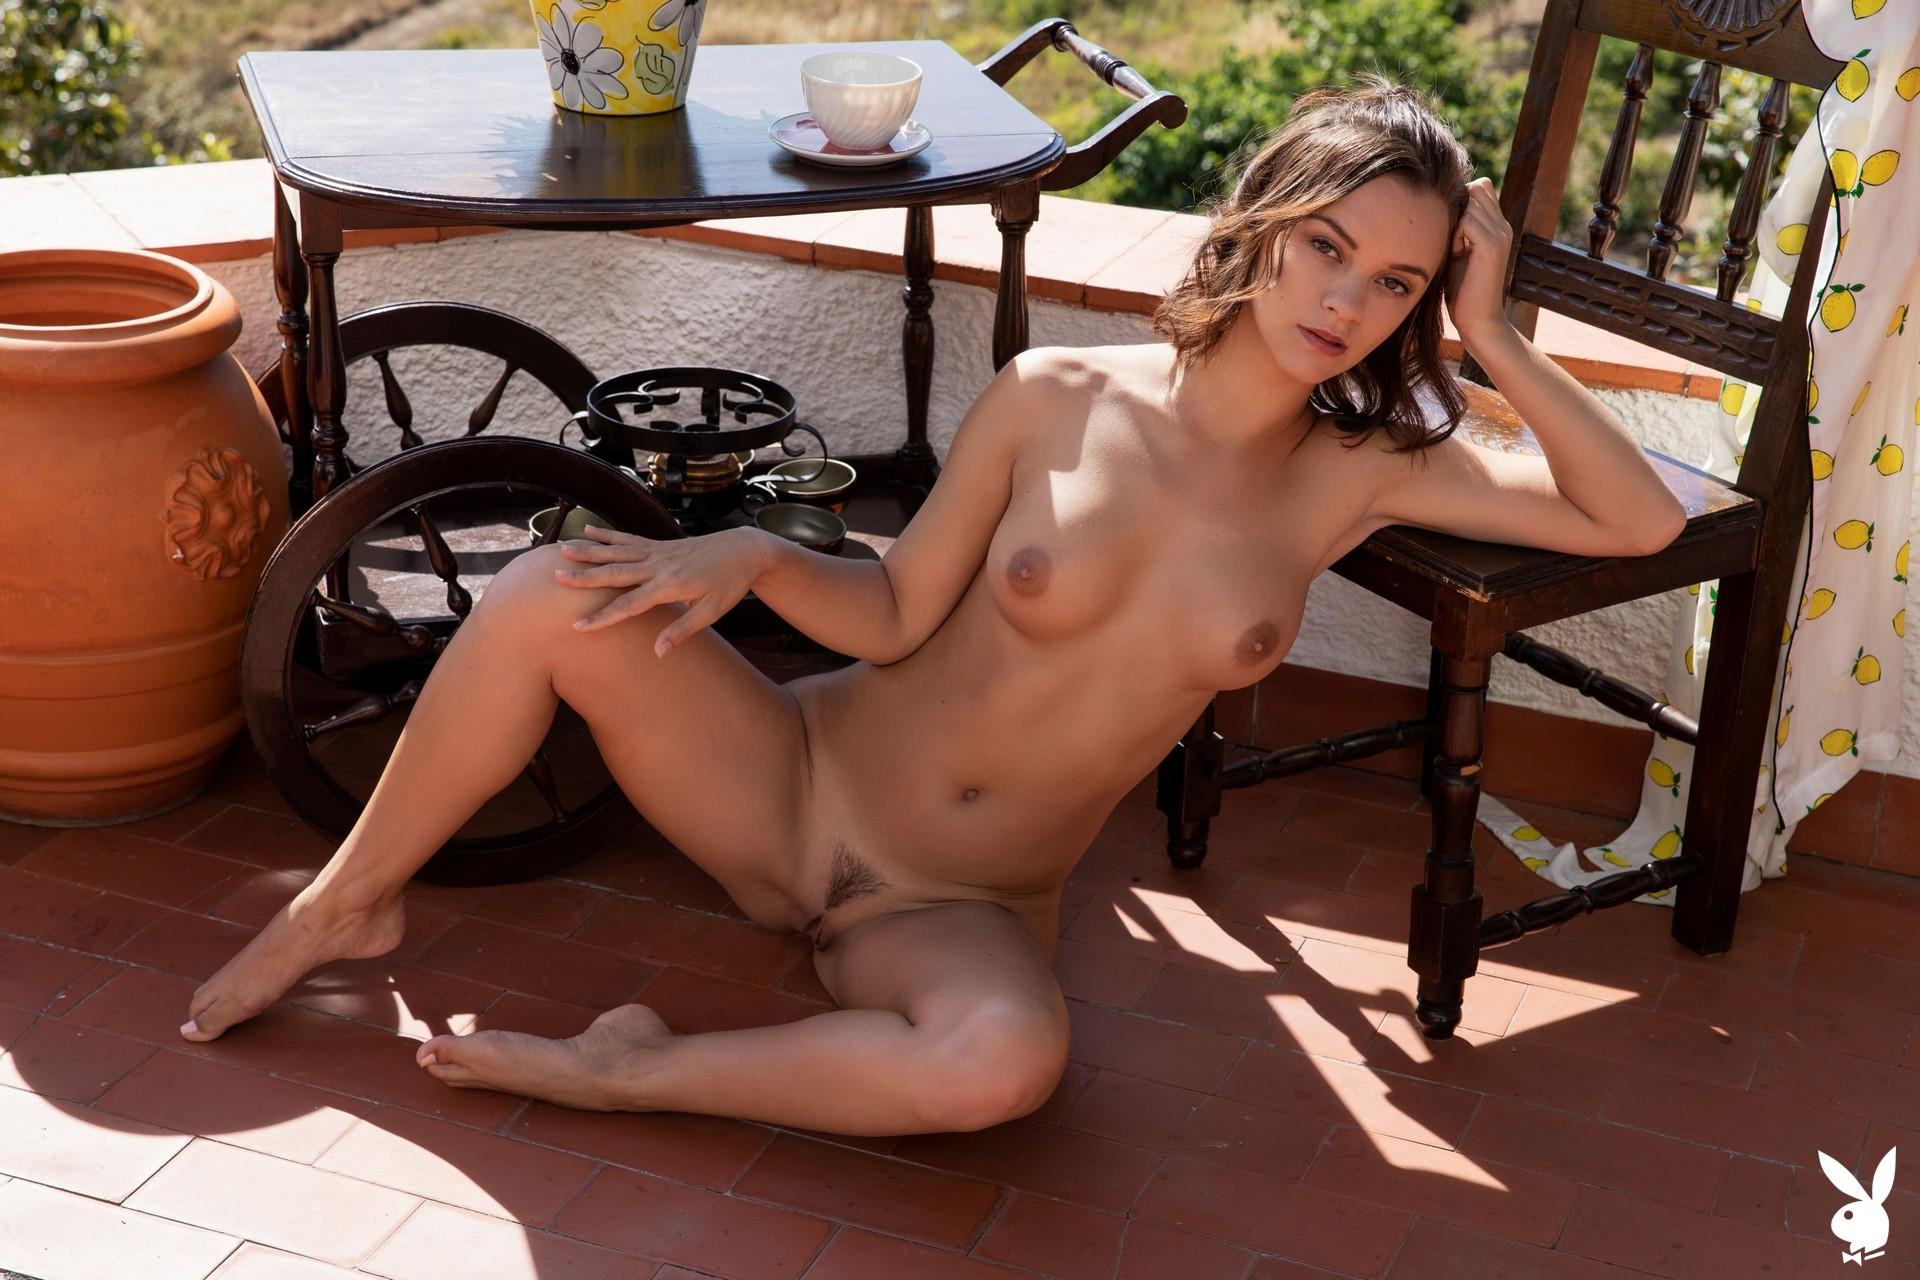 Marine Lecourt In Country Summit Playboy Plus (15)